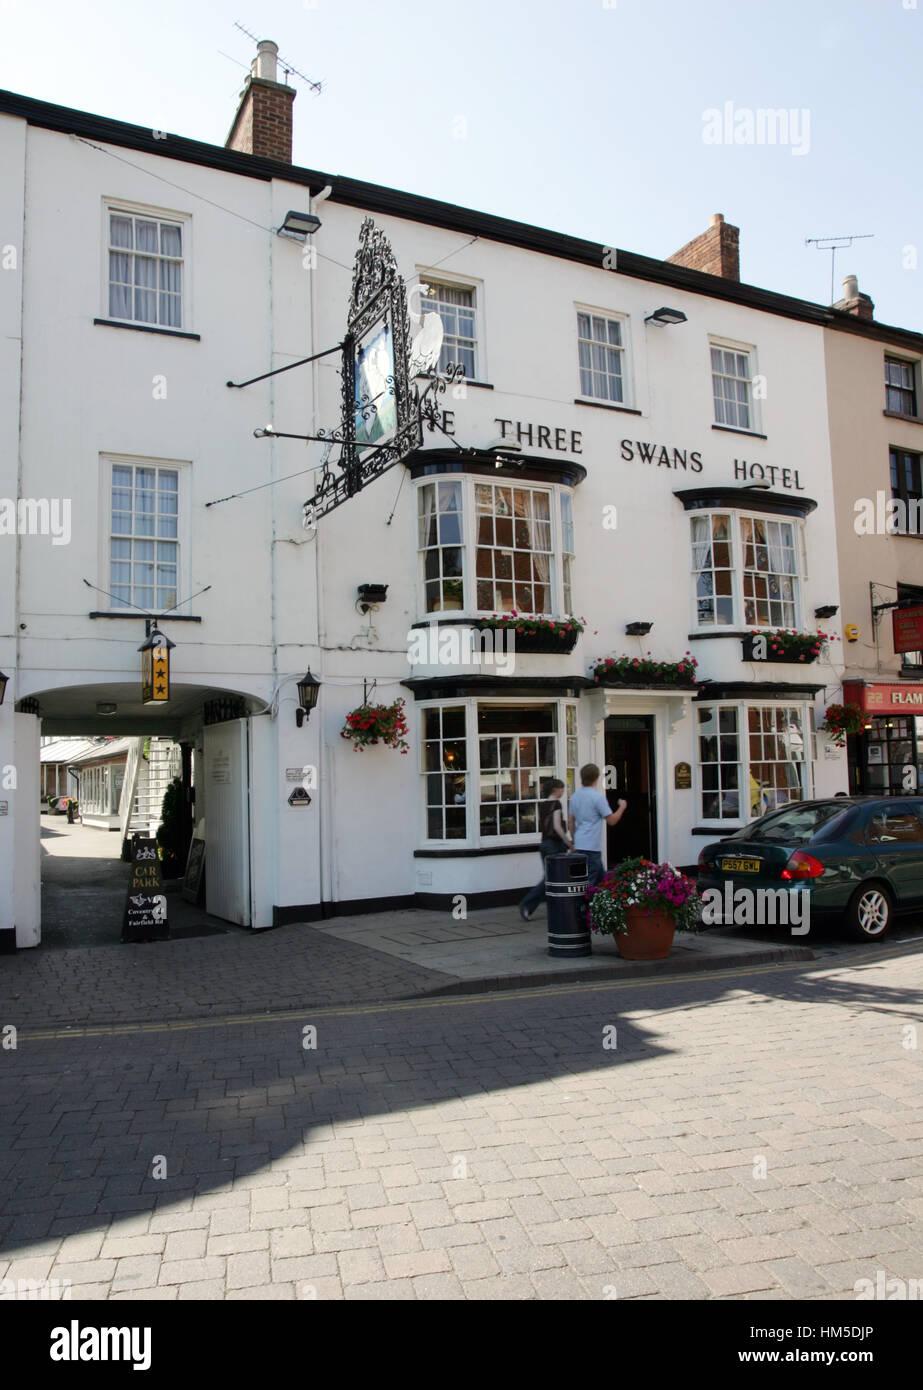 The Three Swans Hotel, Market Harborough - Stock Image